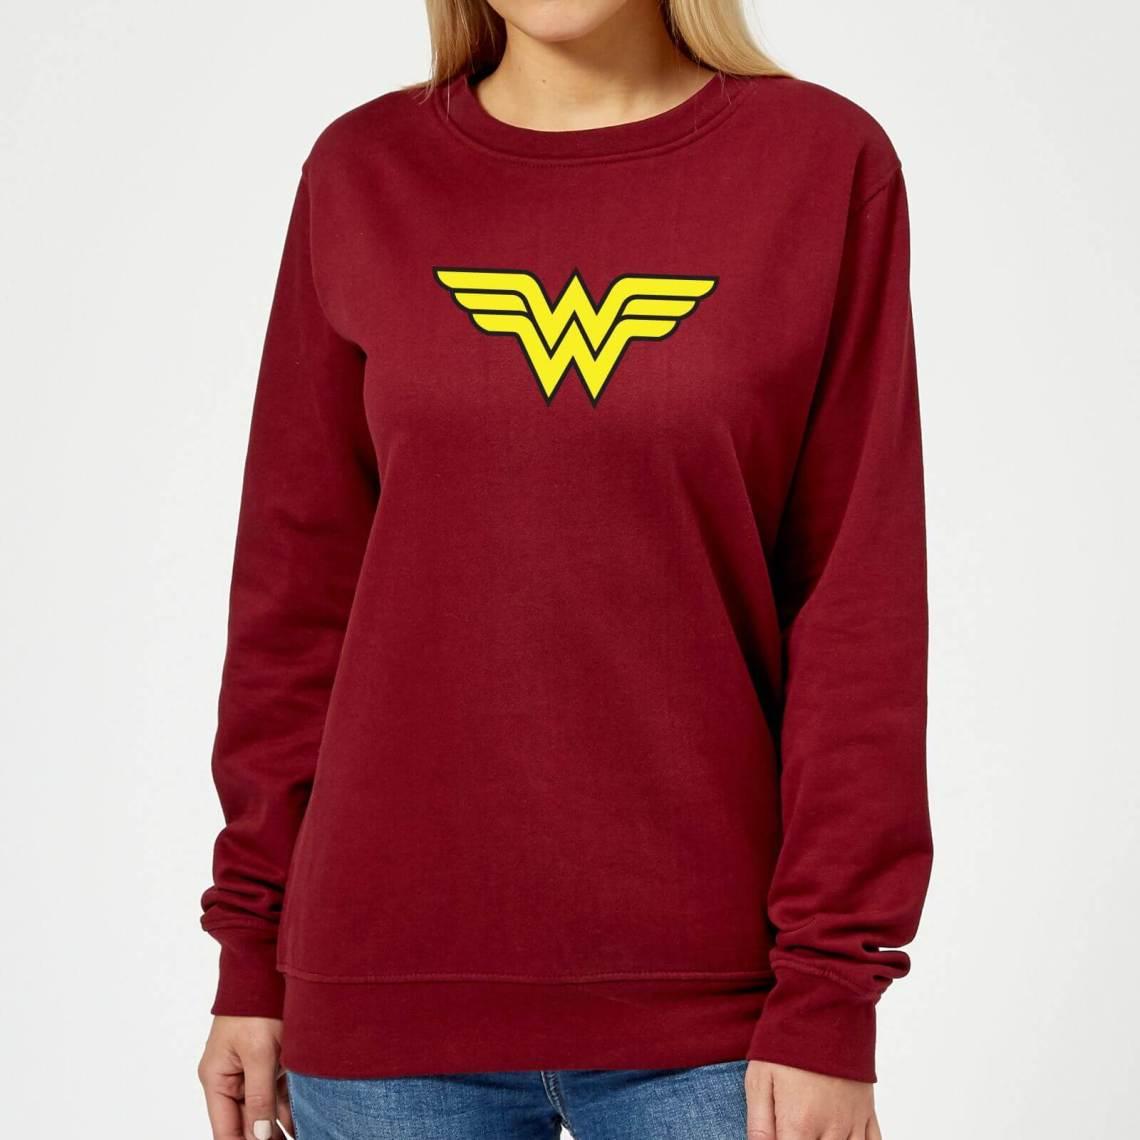 Justice League Wonder Woman Logo Women's Sweatshirt - Burgundy - M - Burgundy